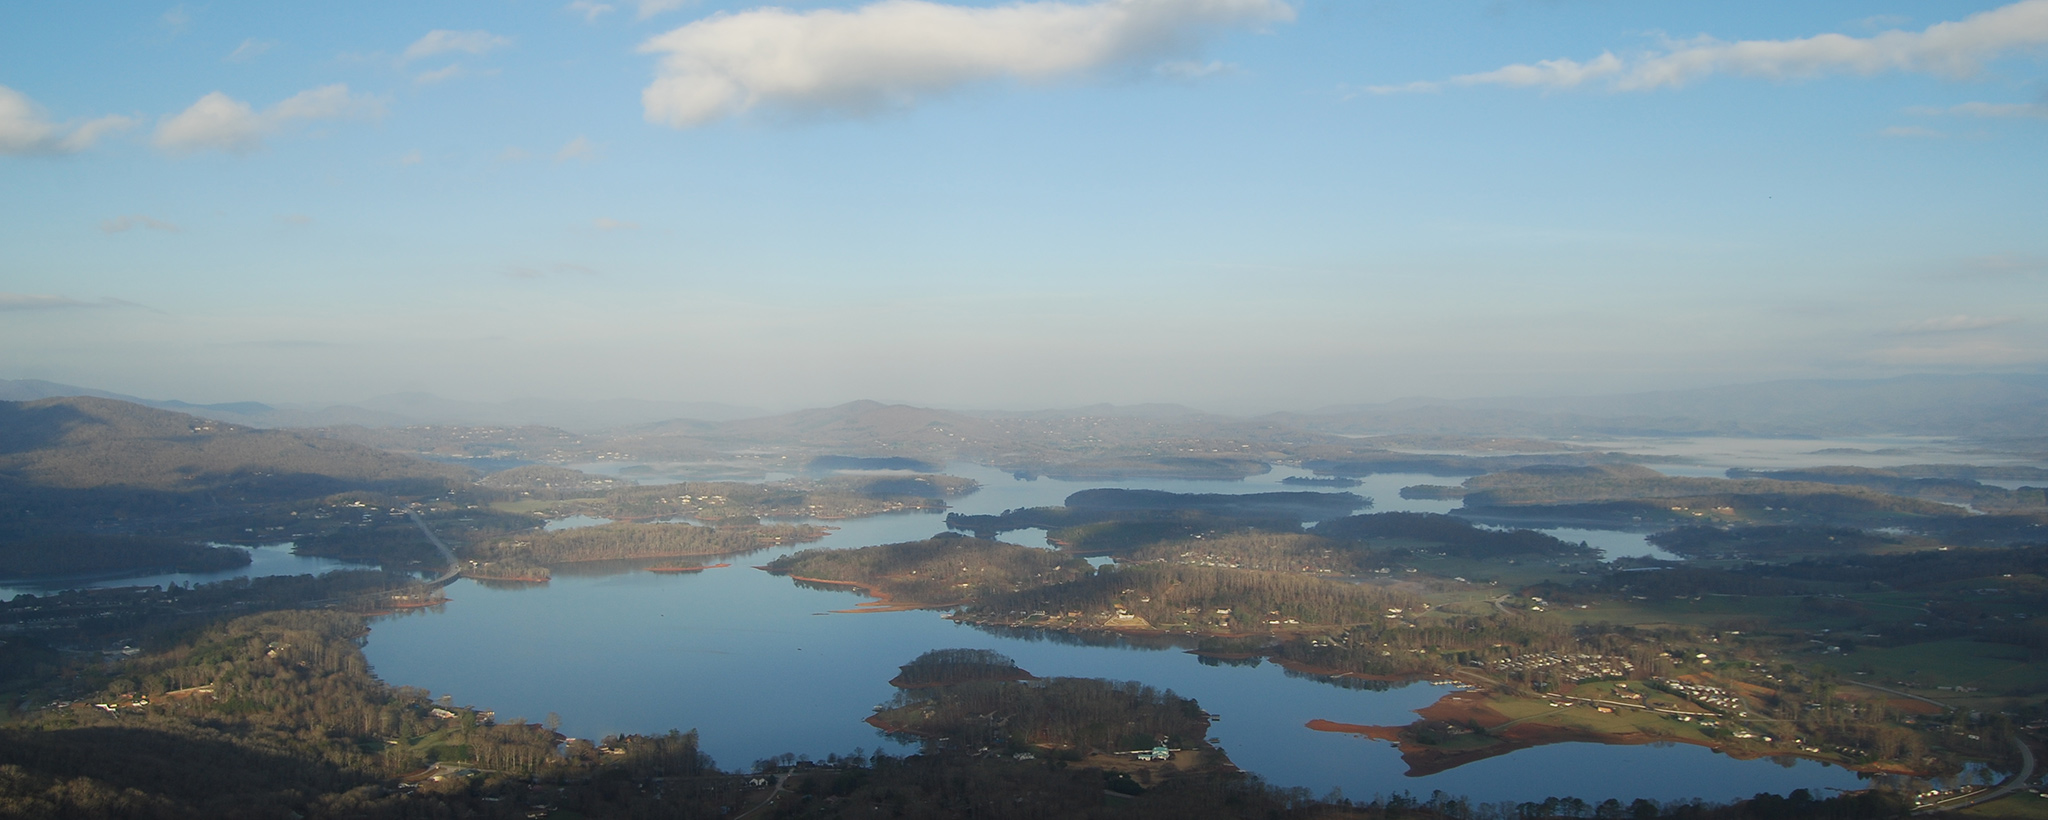 Chatuge Reservoir